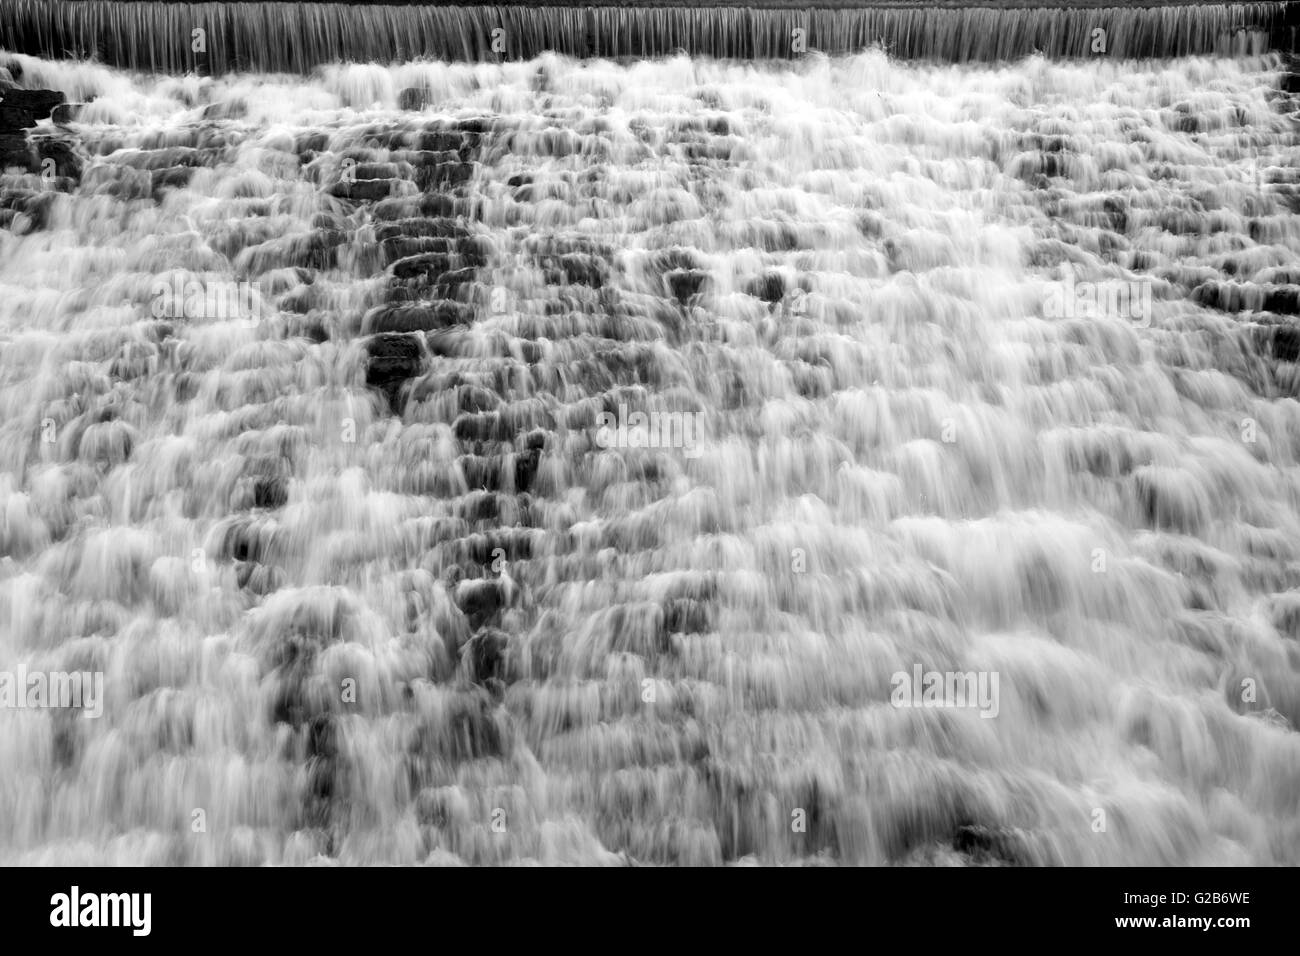 Weir on the River Rea, Shropshire, England, UK - Stock Image